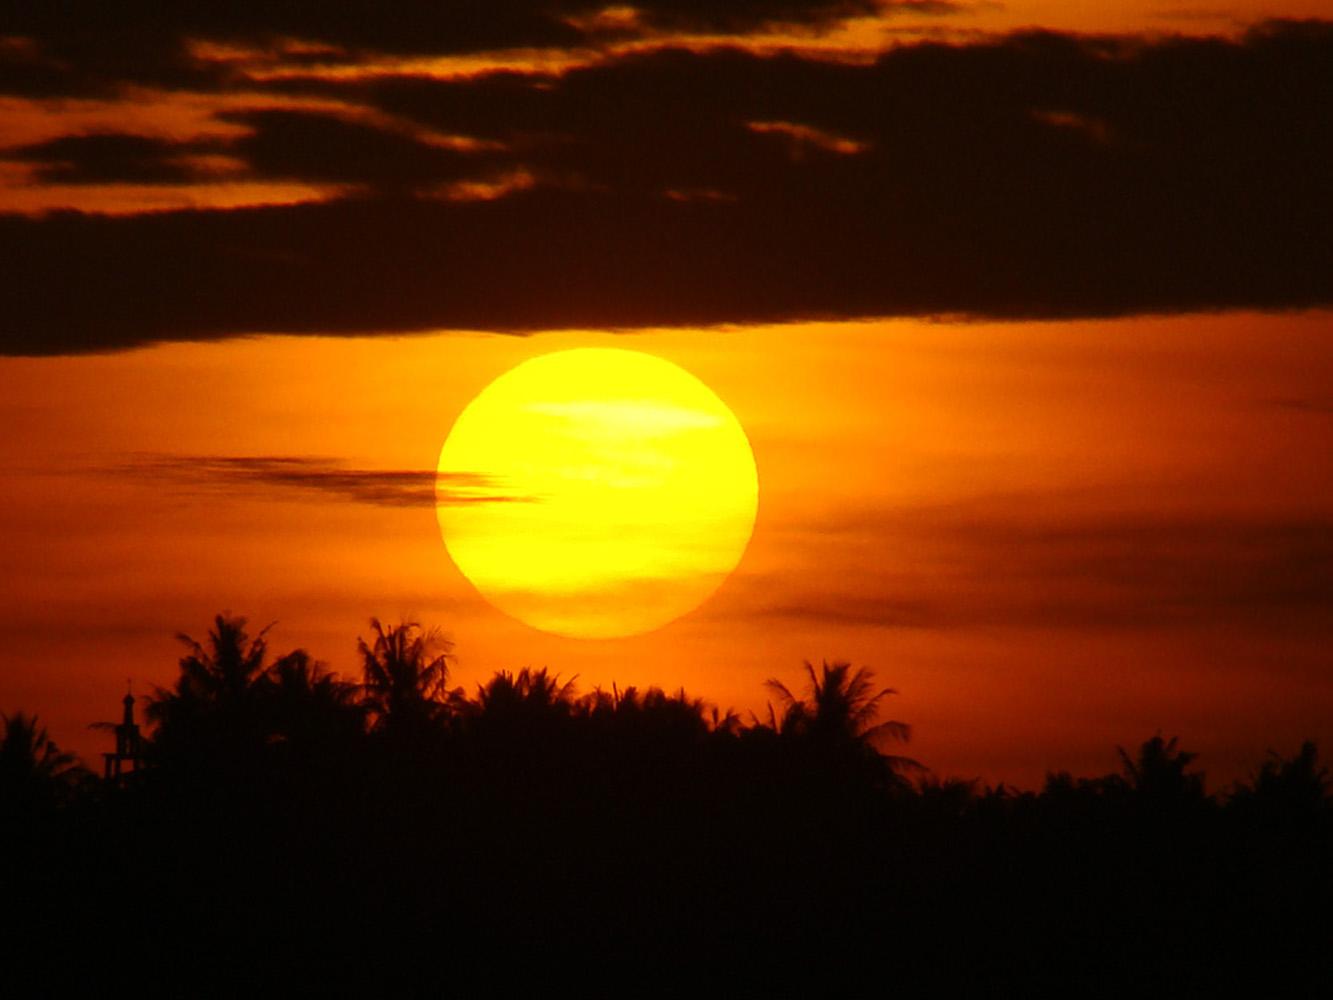 gambar matahari terbit yang indah